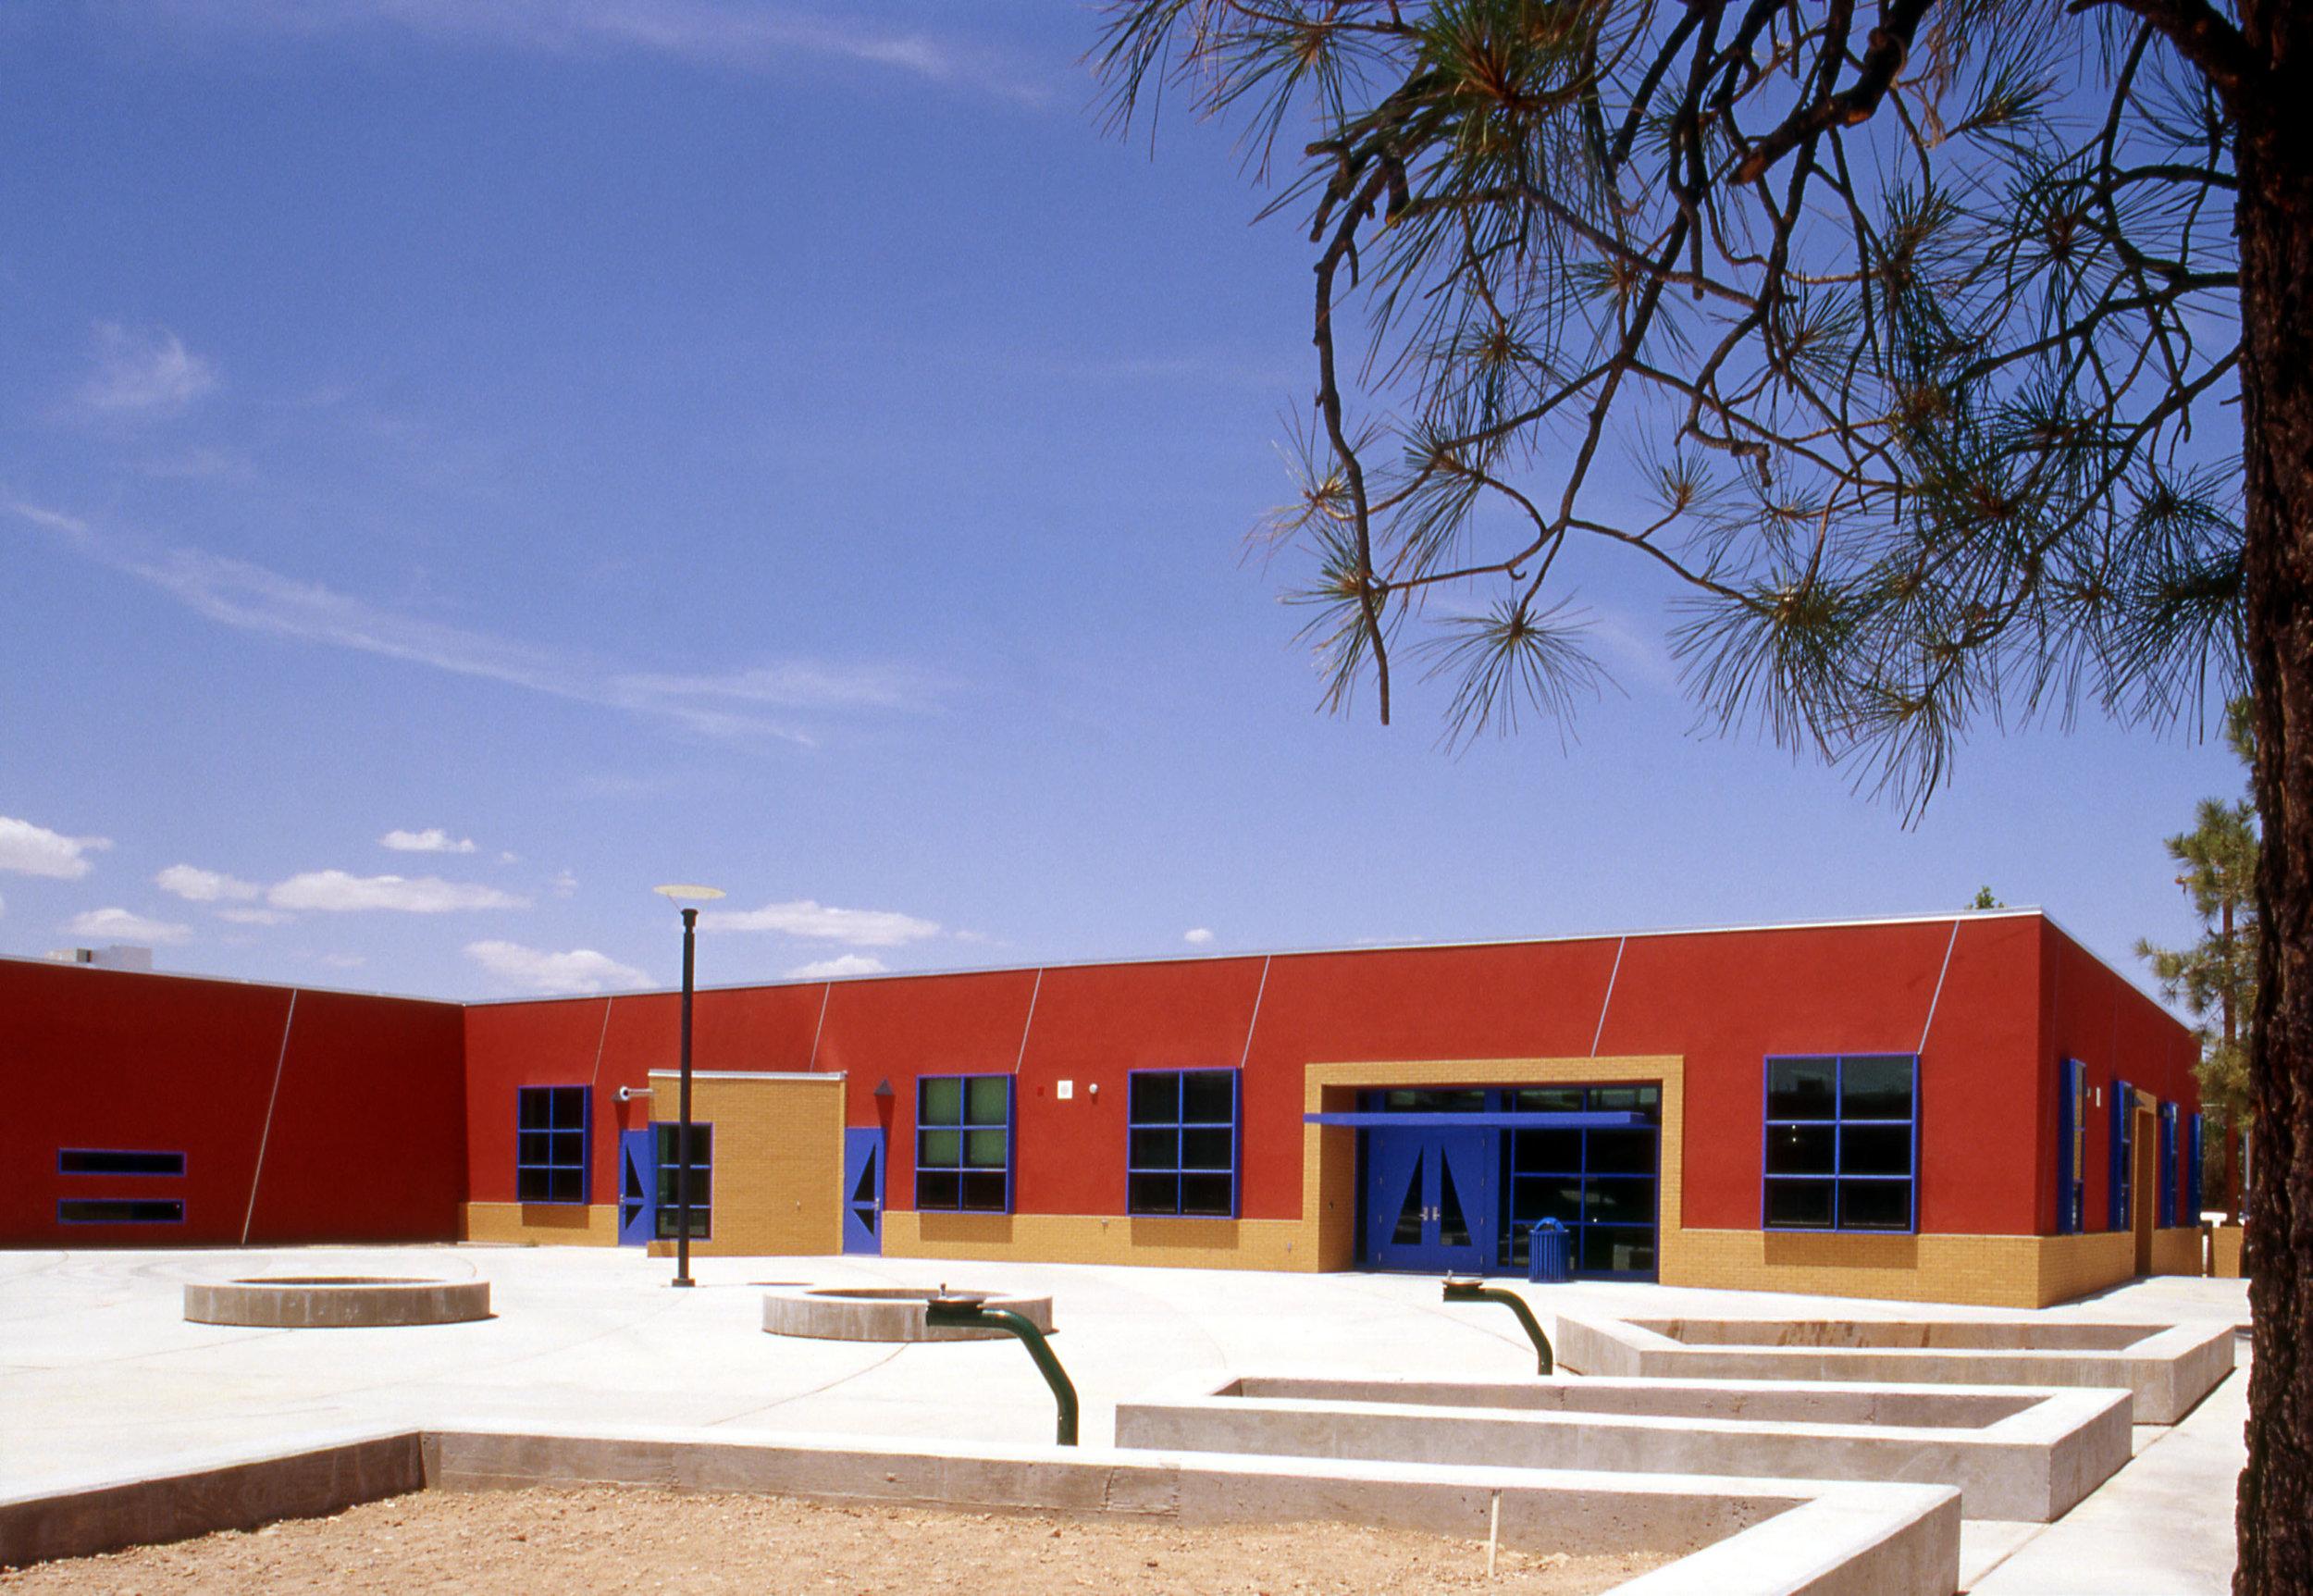 La_Mesa_Elementary_School_03.jpg